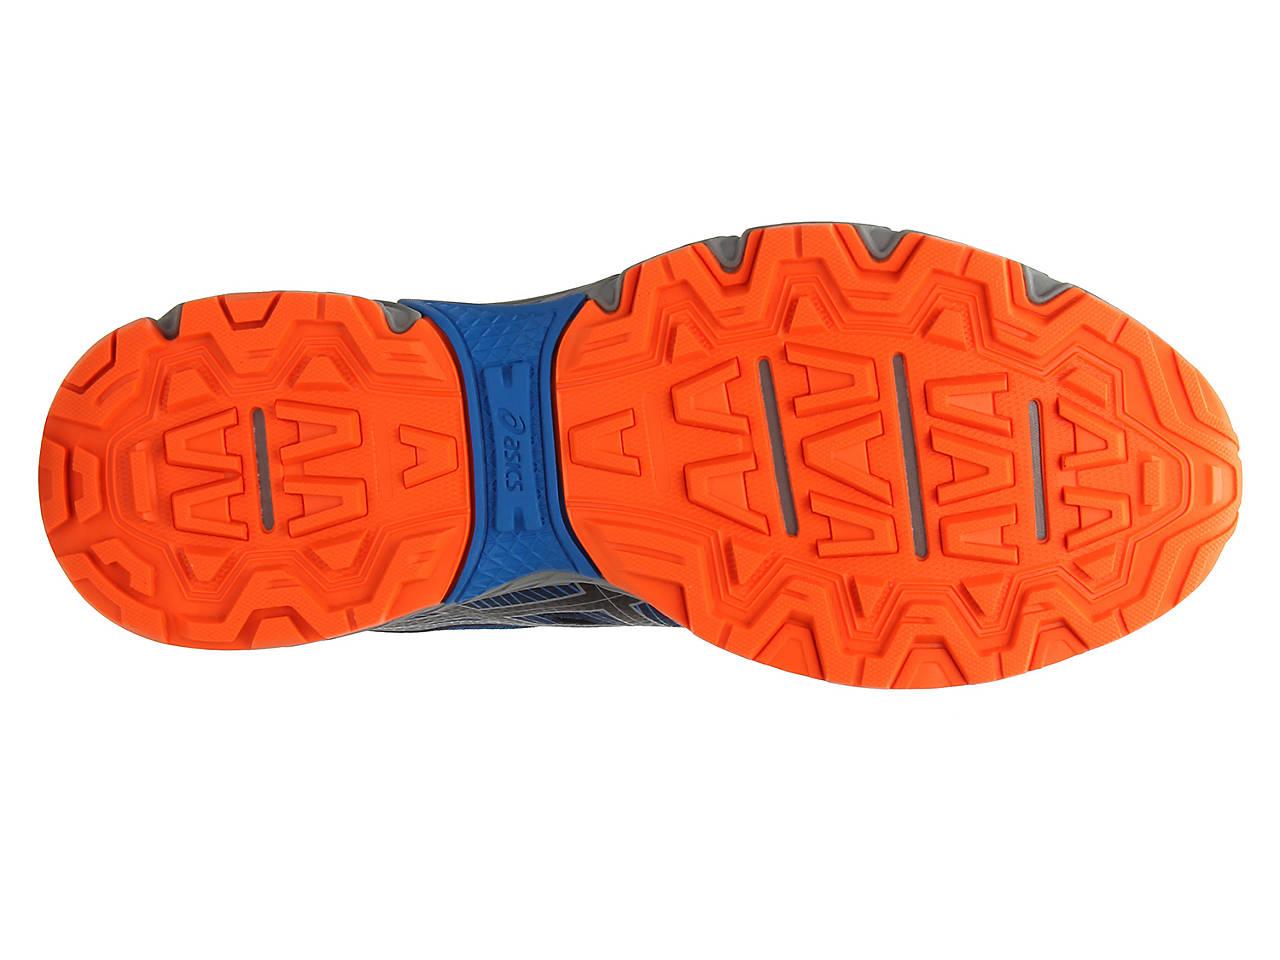 ASICS GEL Venture 7 Trail Running Shoe Men's Men's Shoes   DSW